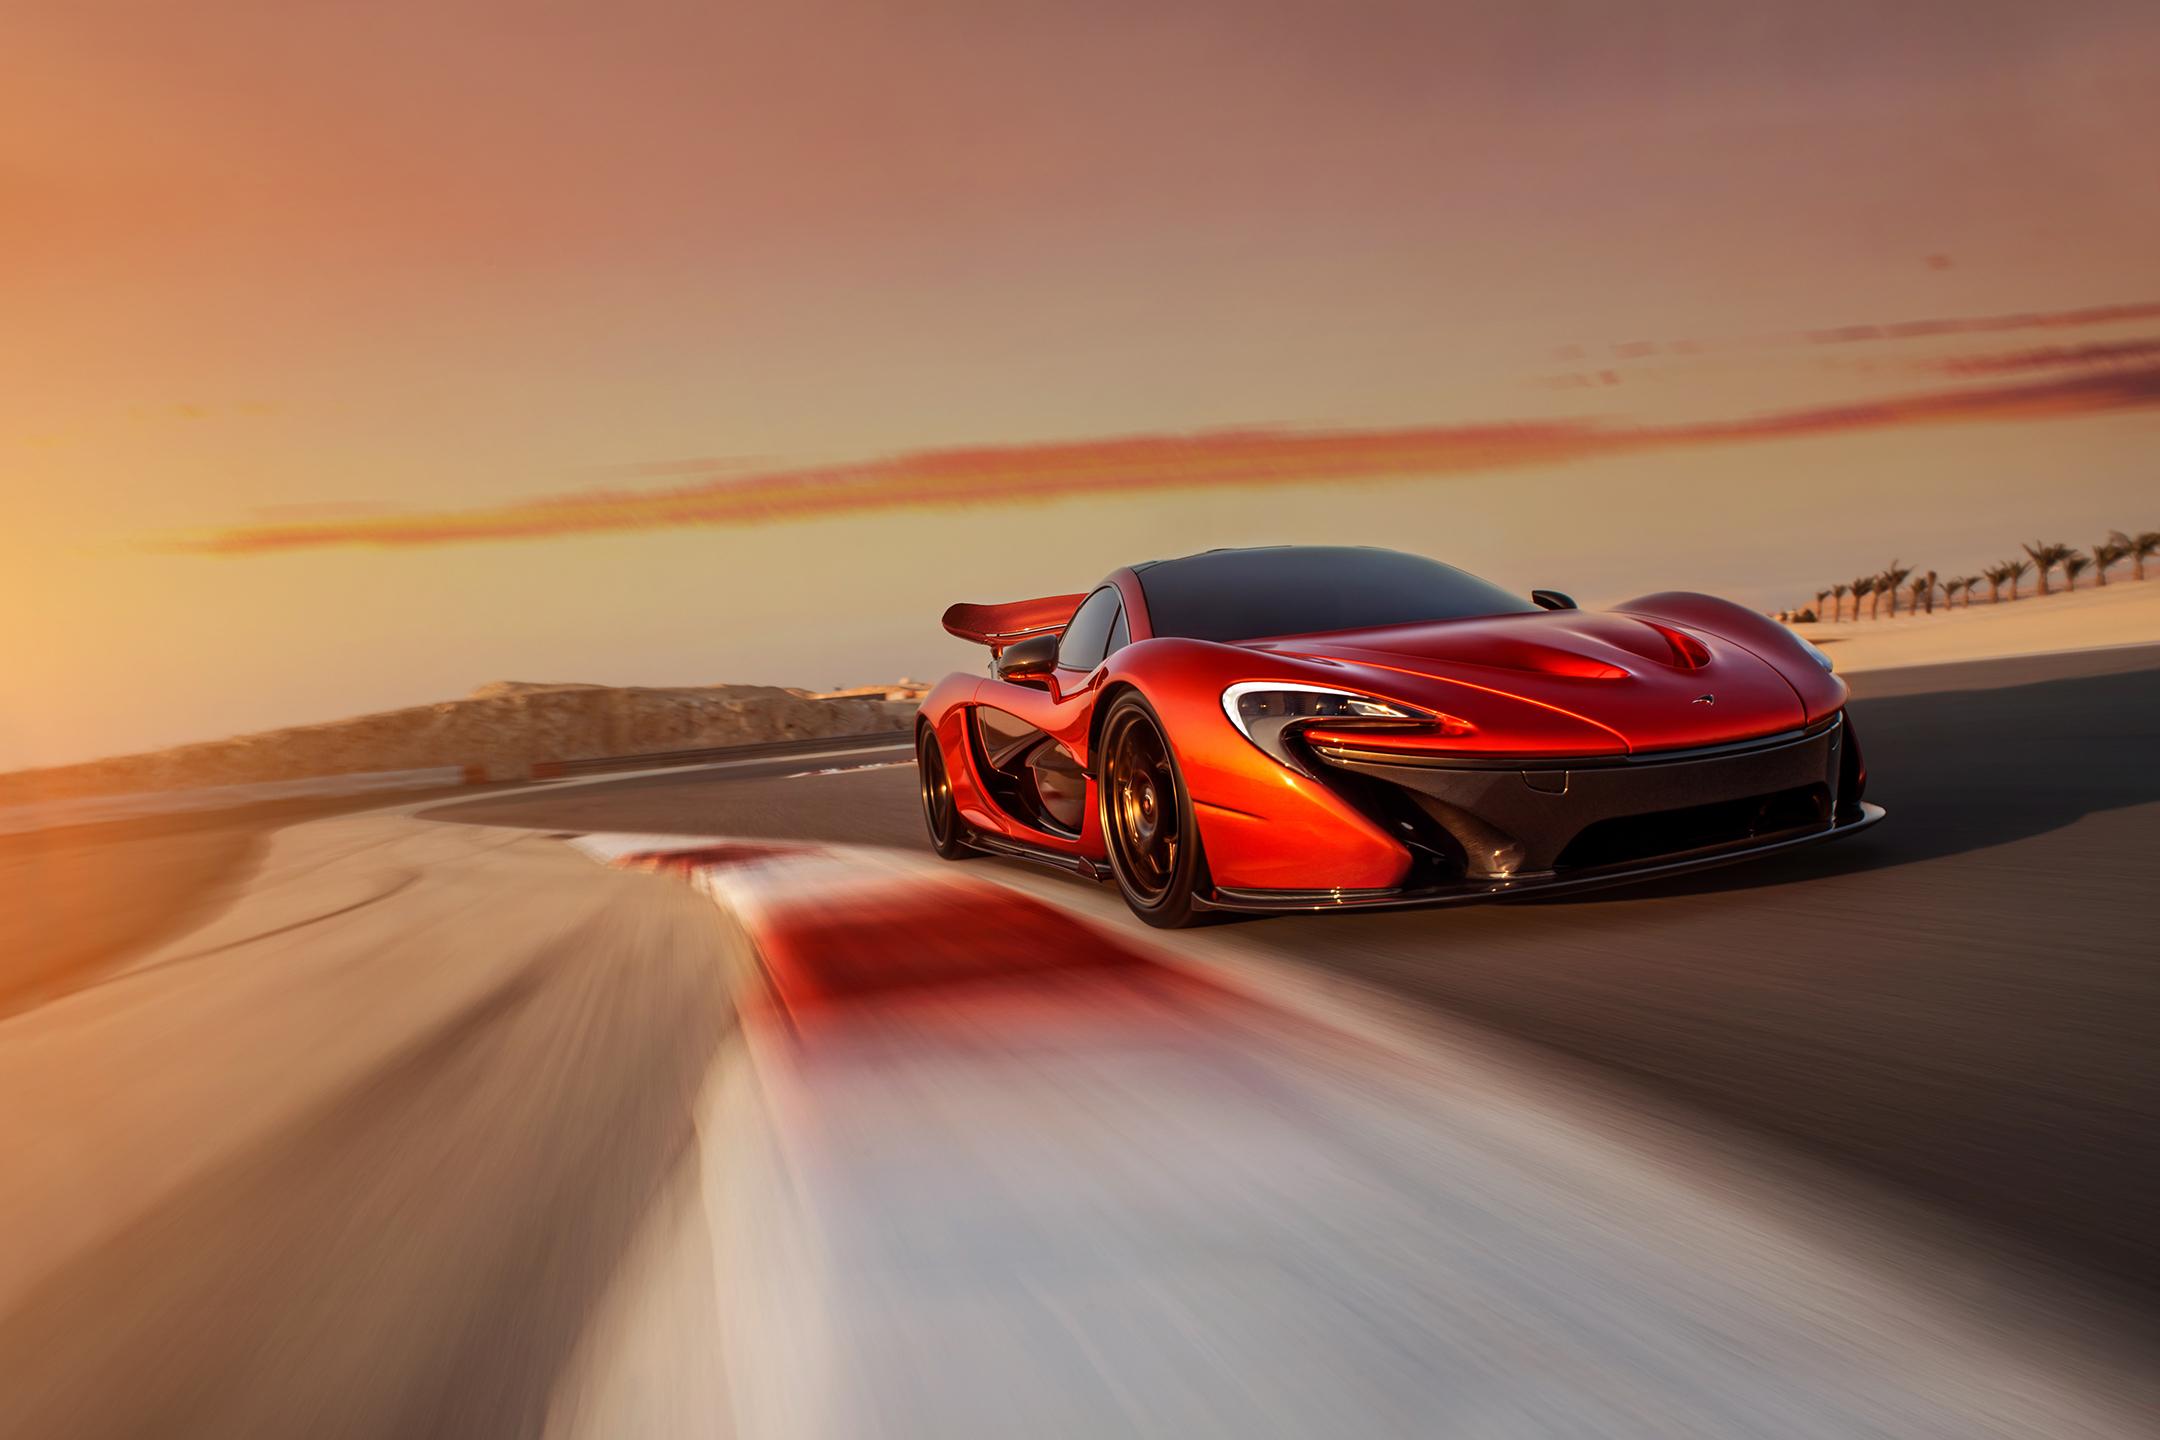 McLaren P1 - 2012 - front track